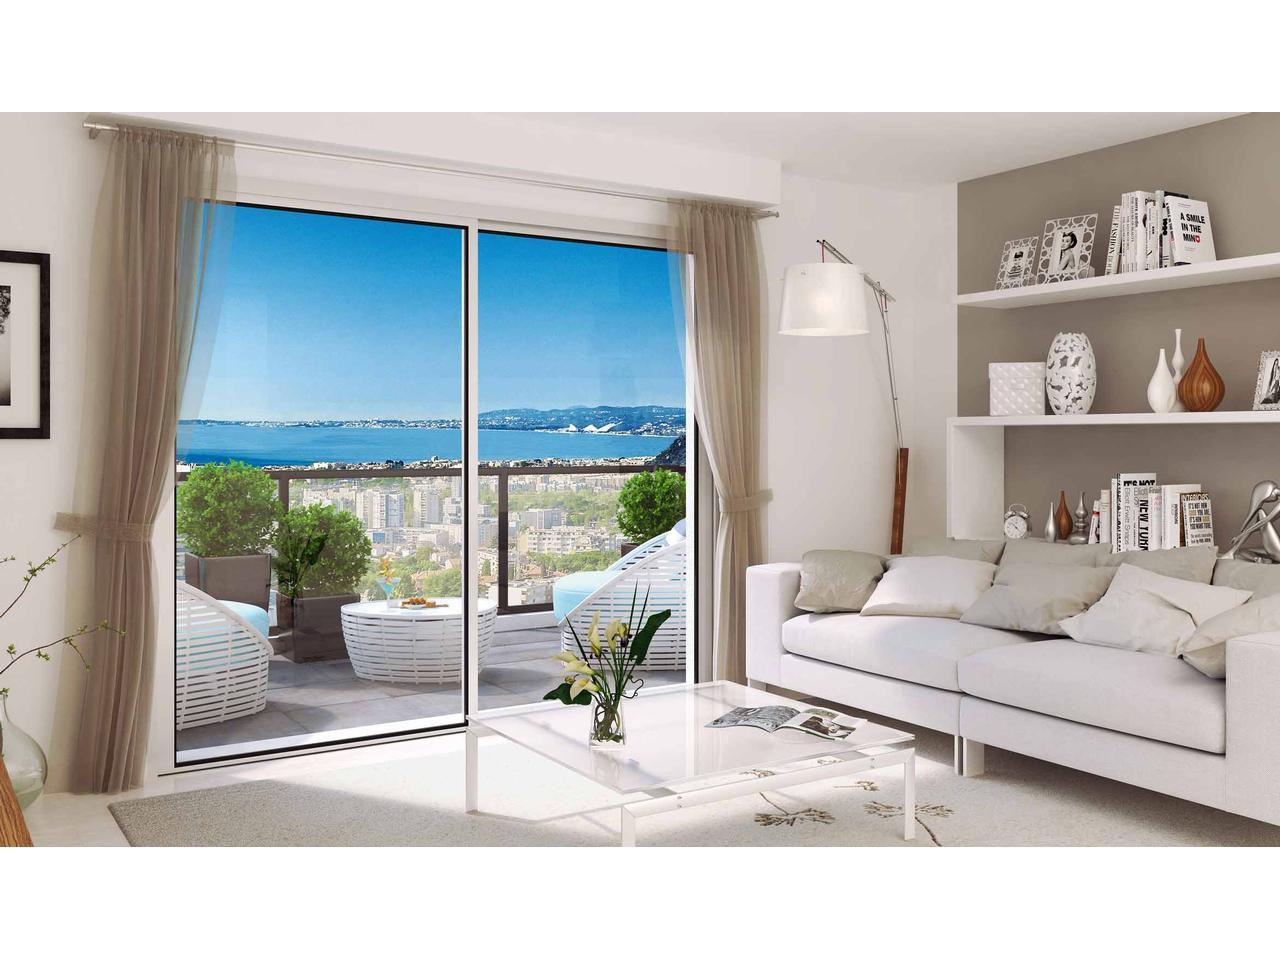 immobilier nice vue mer appartement nice studio neuf nice ouest vefa a vendre vue mer. Black Bedroom Furniture Sets. Home Design Ideas